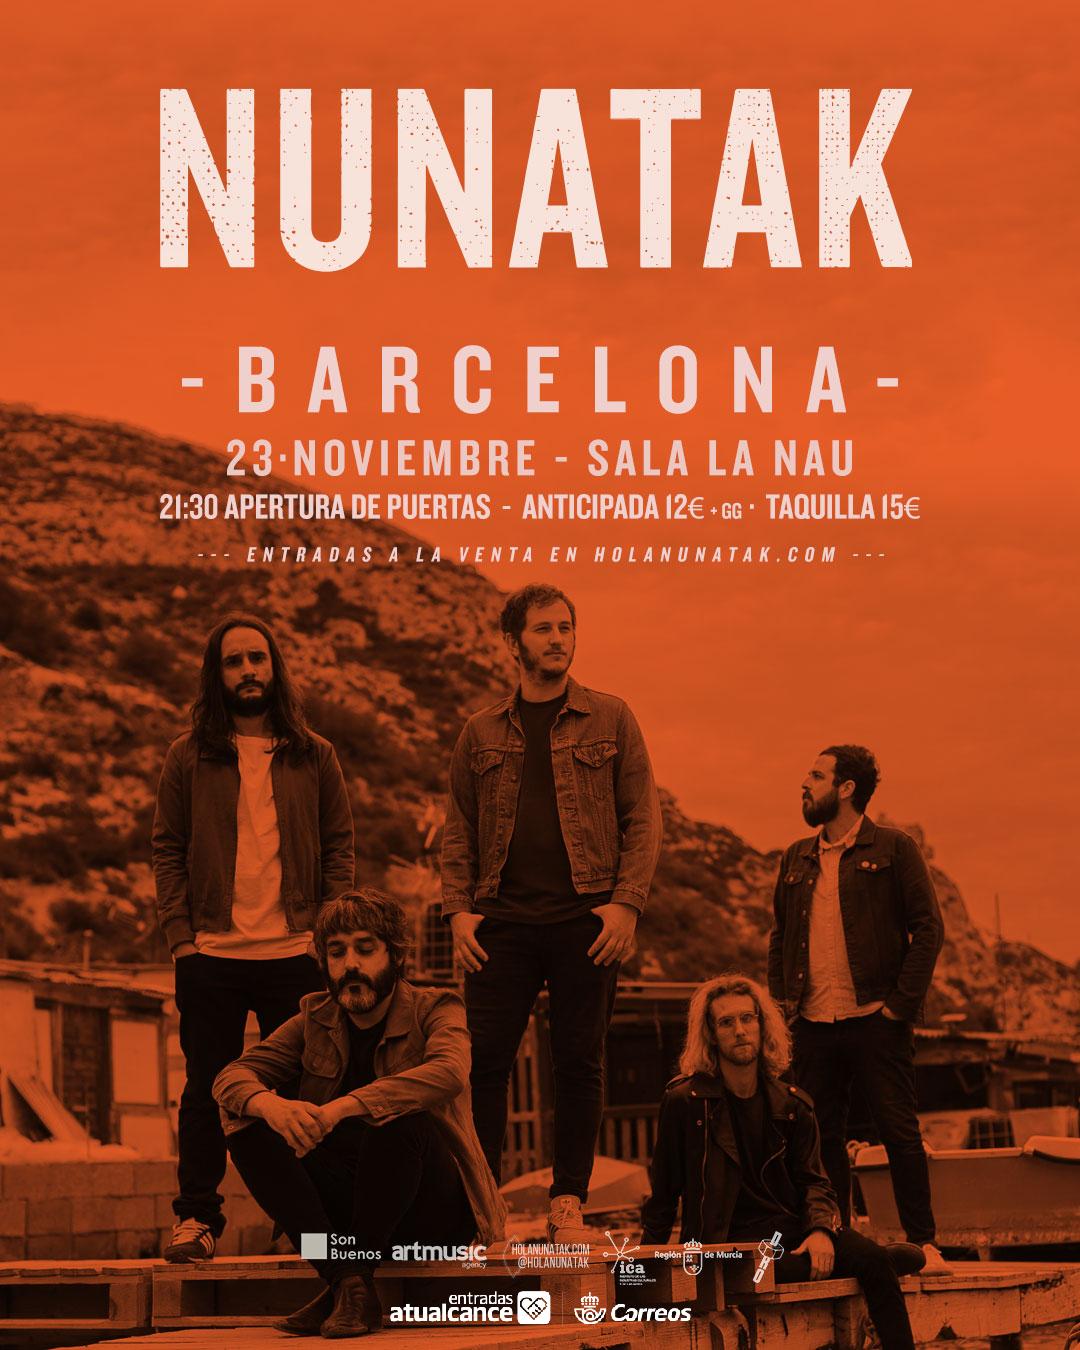 nunatak-en-barcelona-5ce3dc0bec6aa.jpeg